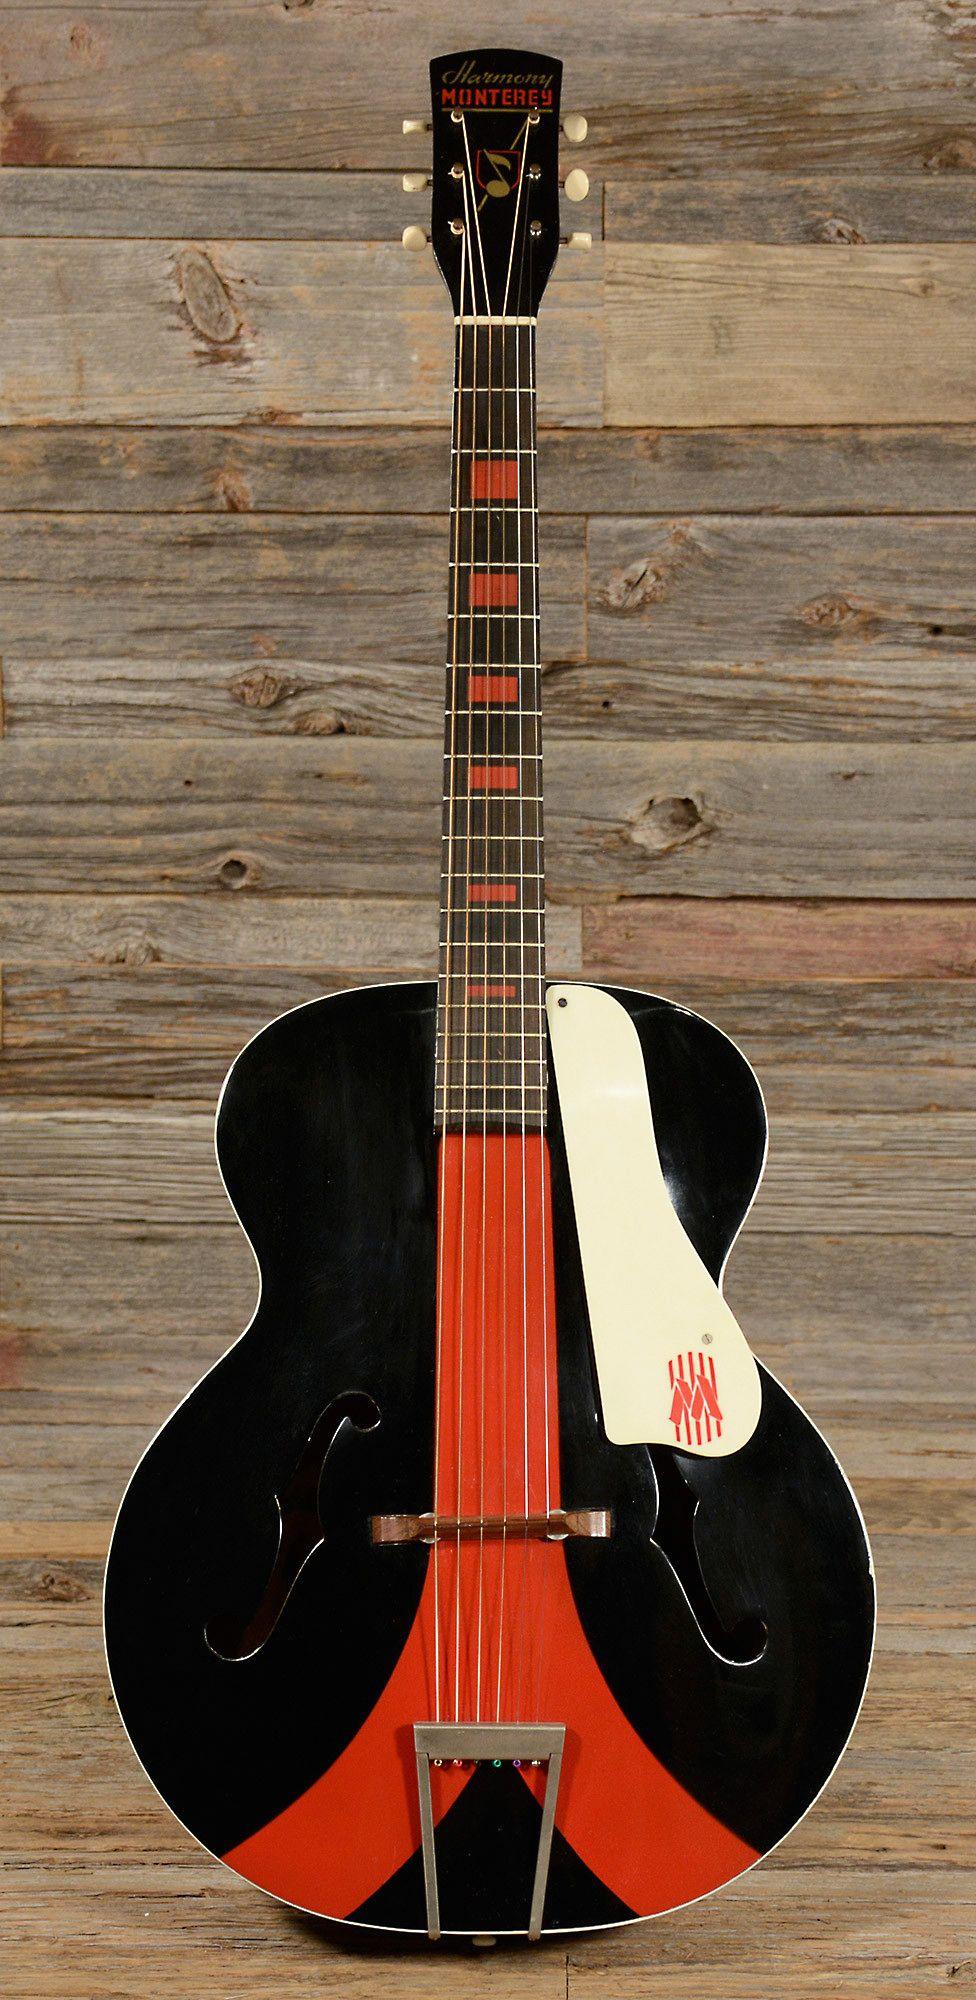 Digging this HARMONY Monterey Colorama Archtop Black/Red 1958 (s952) http://www.guitarandmusicinstitute.com